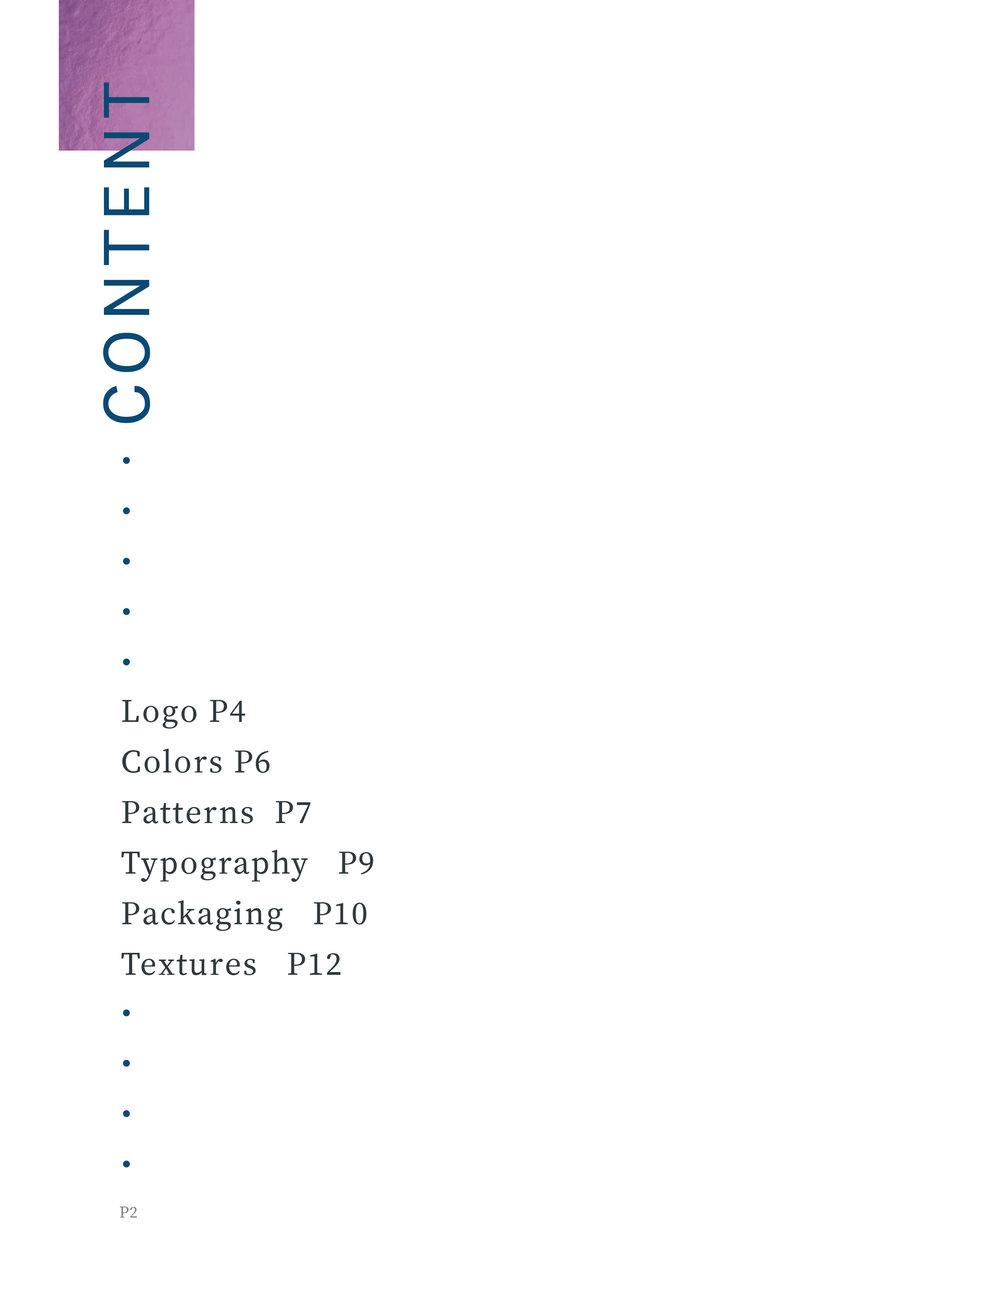 H2O+ Brand Style Guide_0405192.jpg